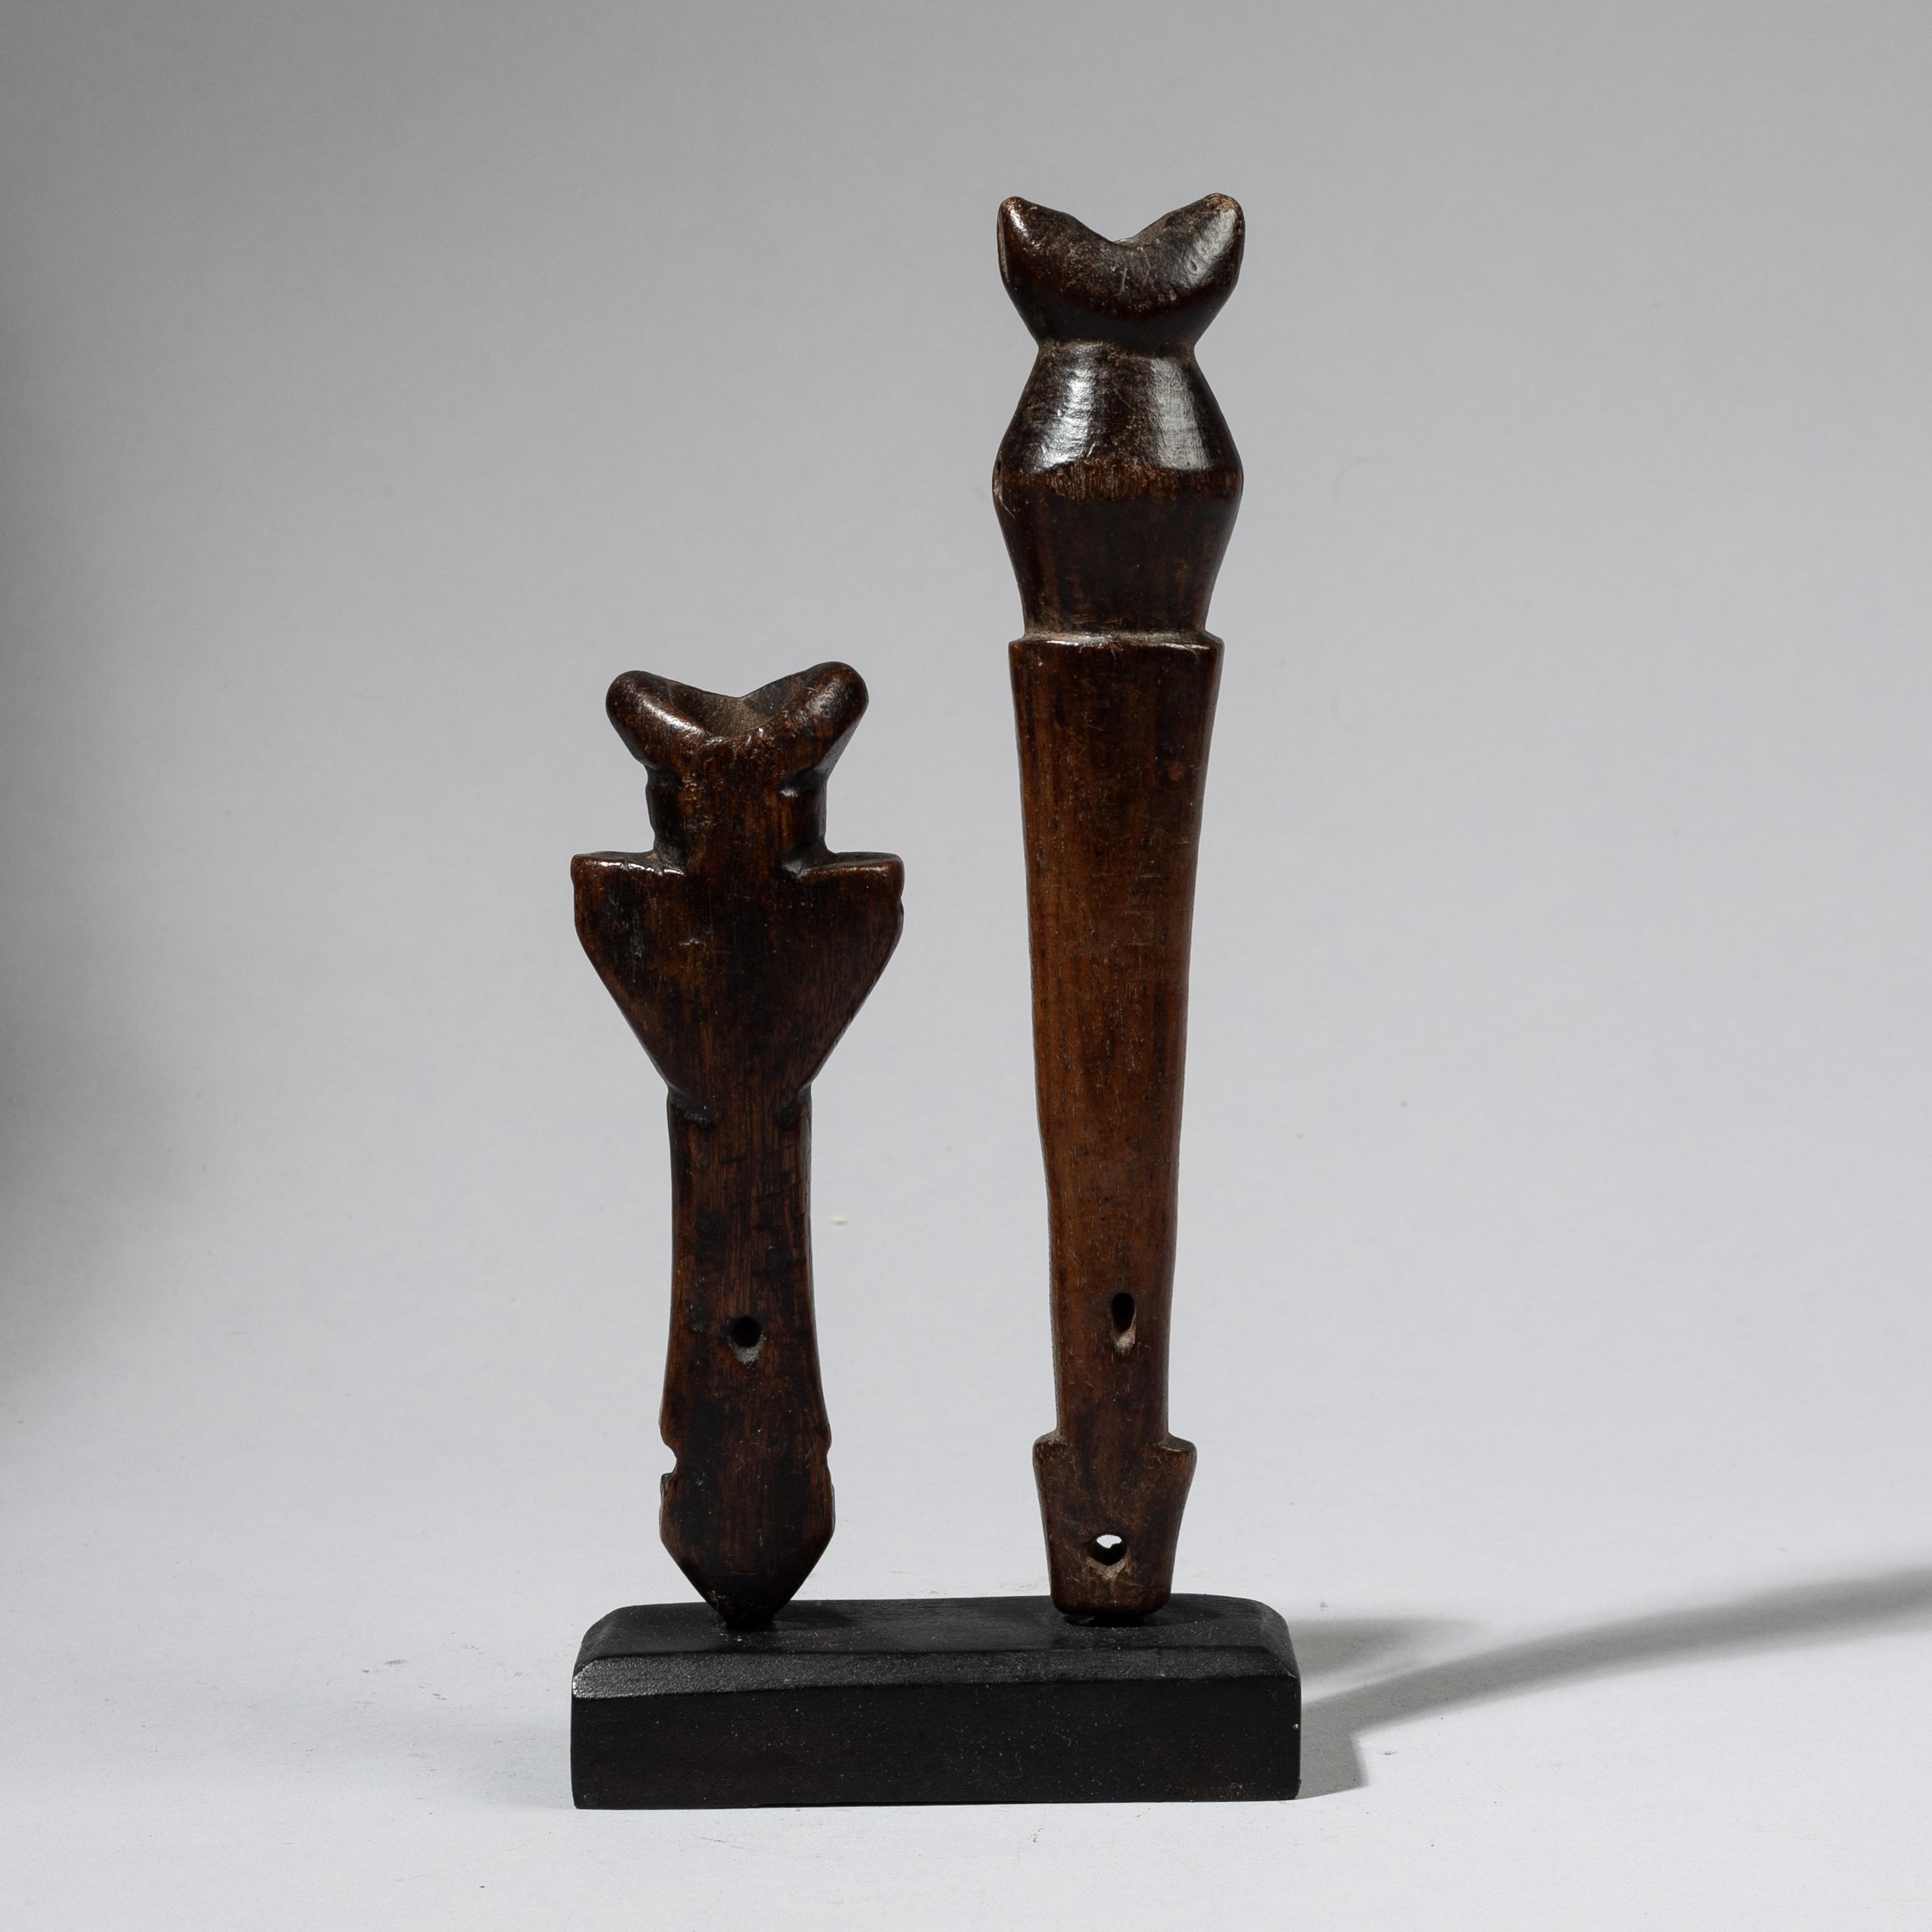 2 SOPHISTICATED WHISTLES, LOBI TRIBE BURKINA FASO W. AFRICA ( No 4411)